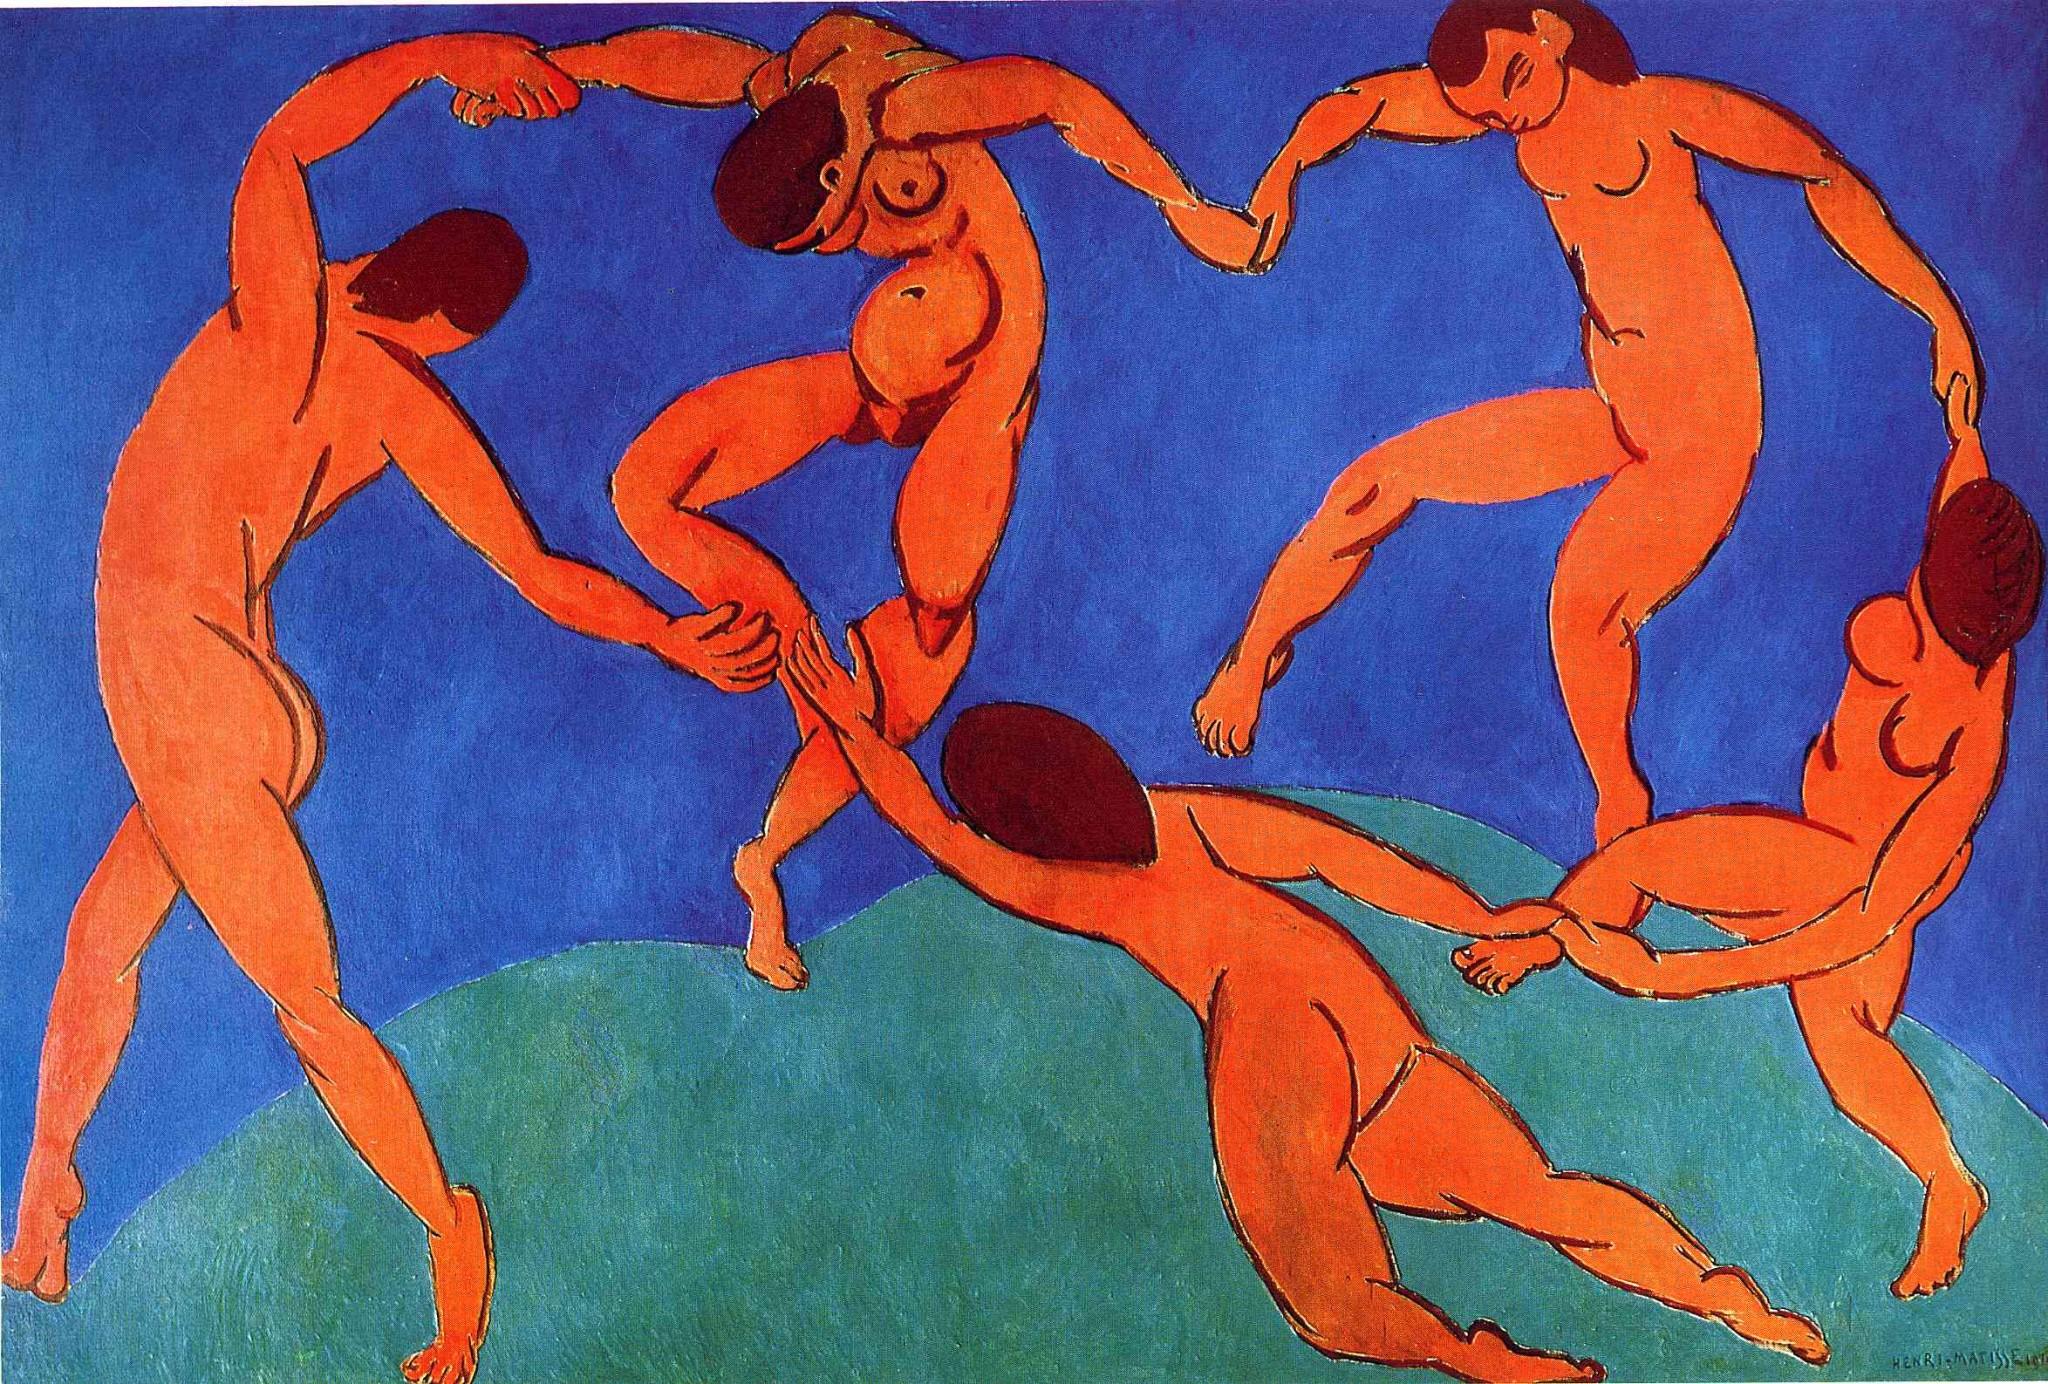 Henri Matisse (Dance II 1910)